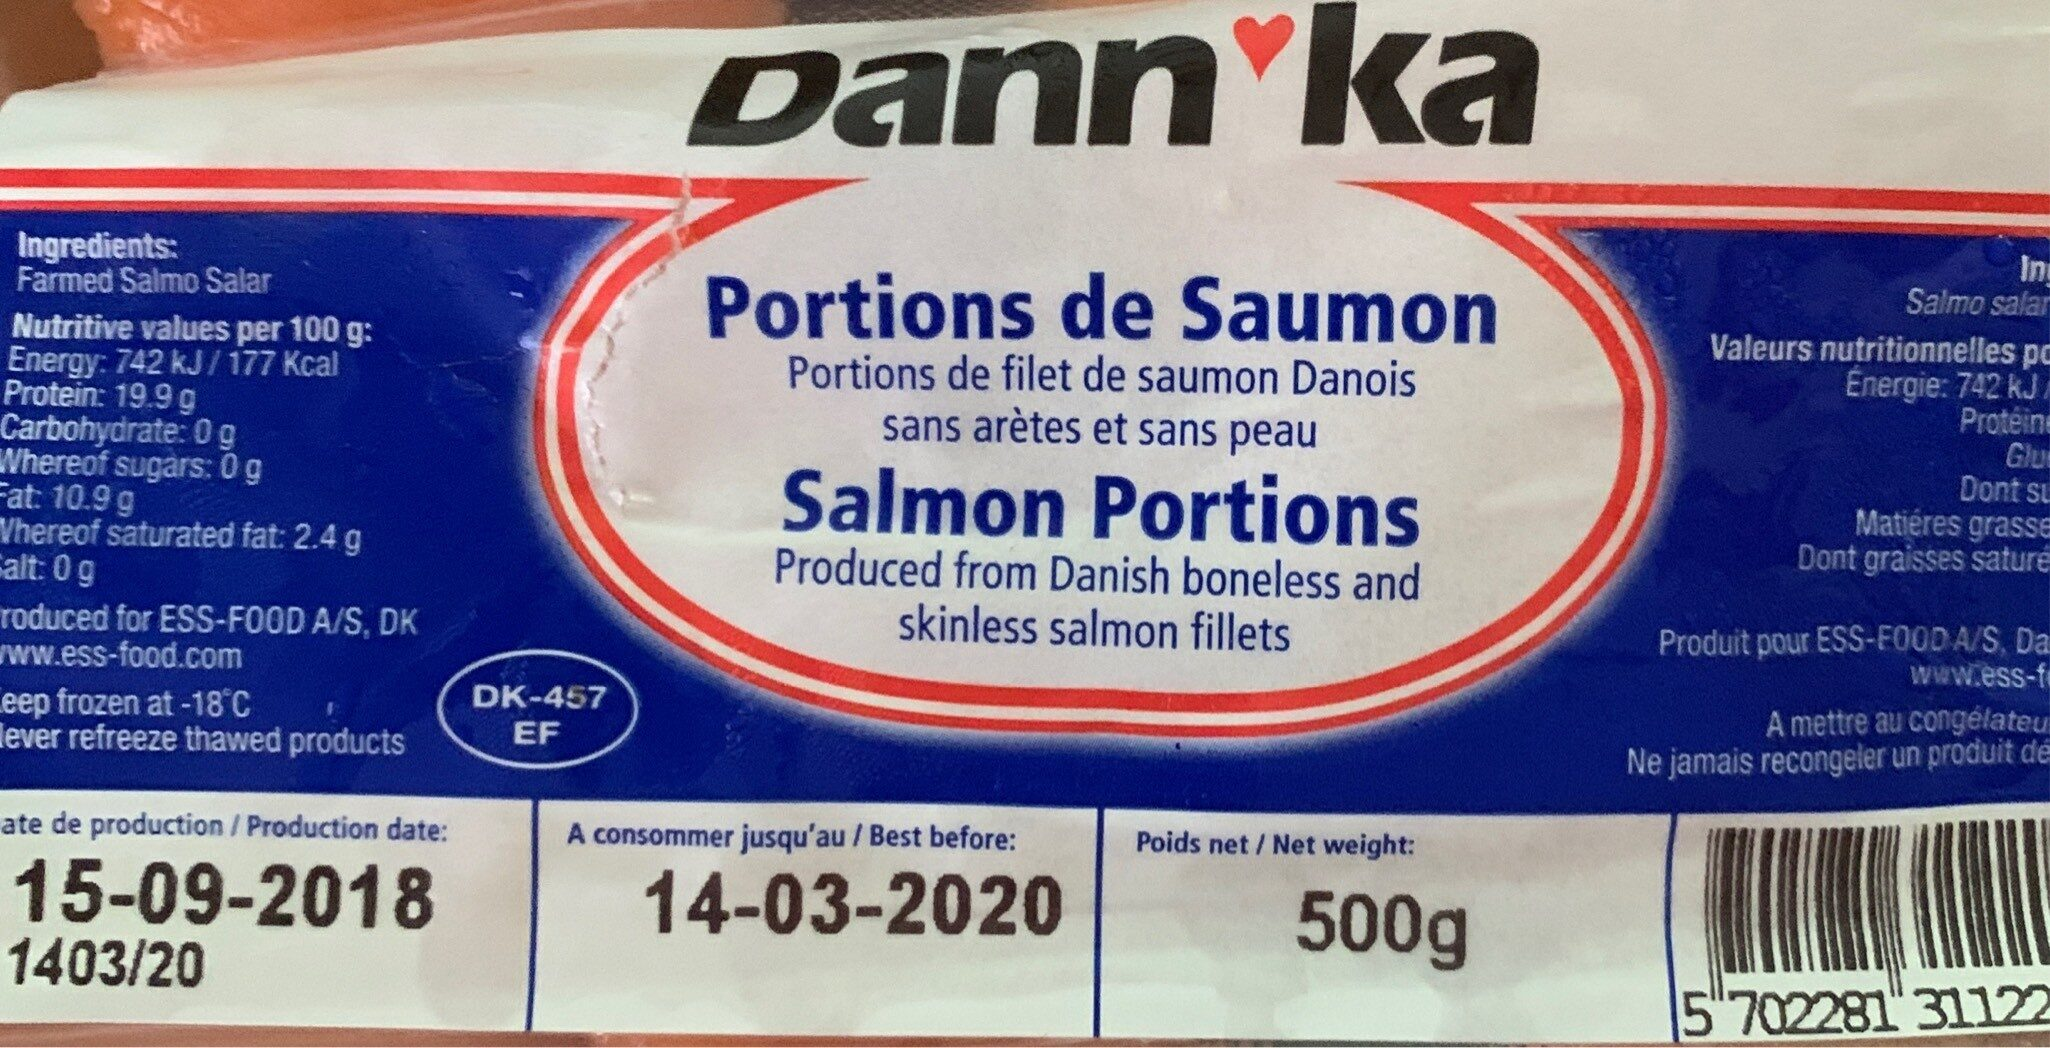 Portions de samin - Produit - fr